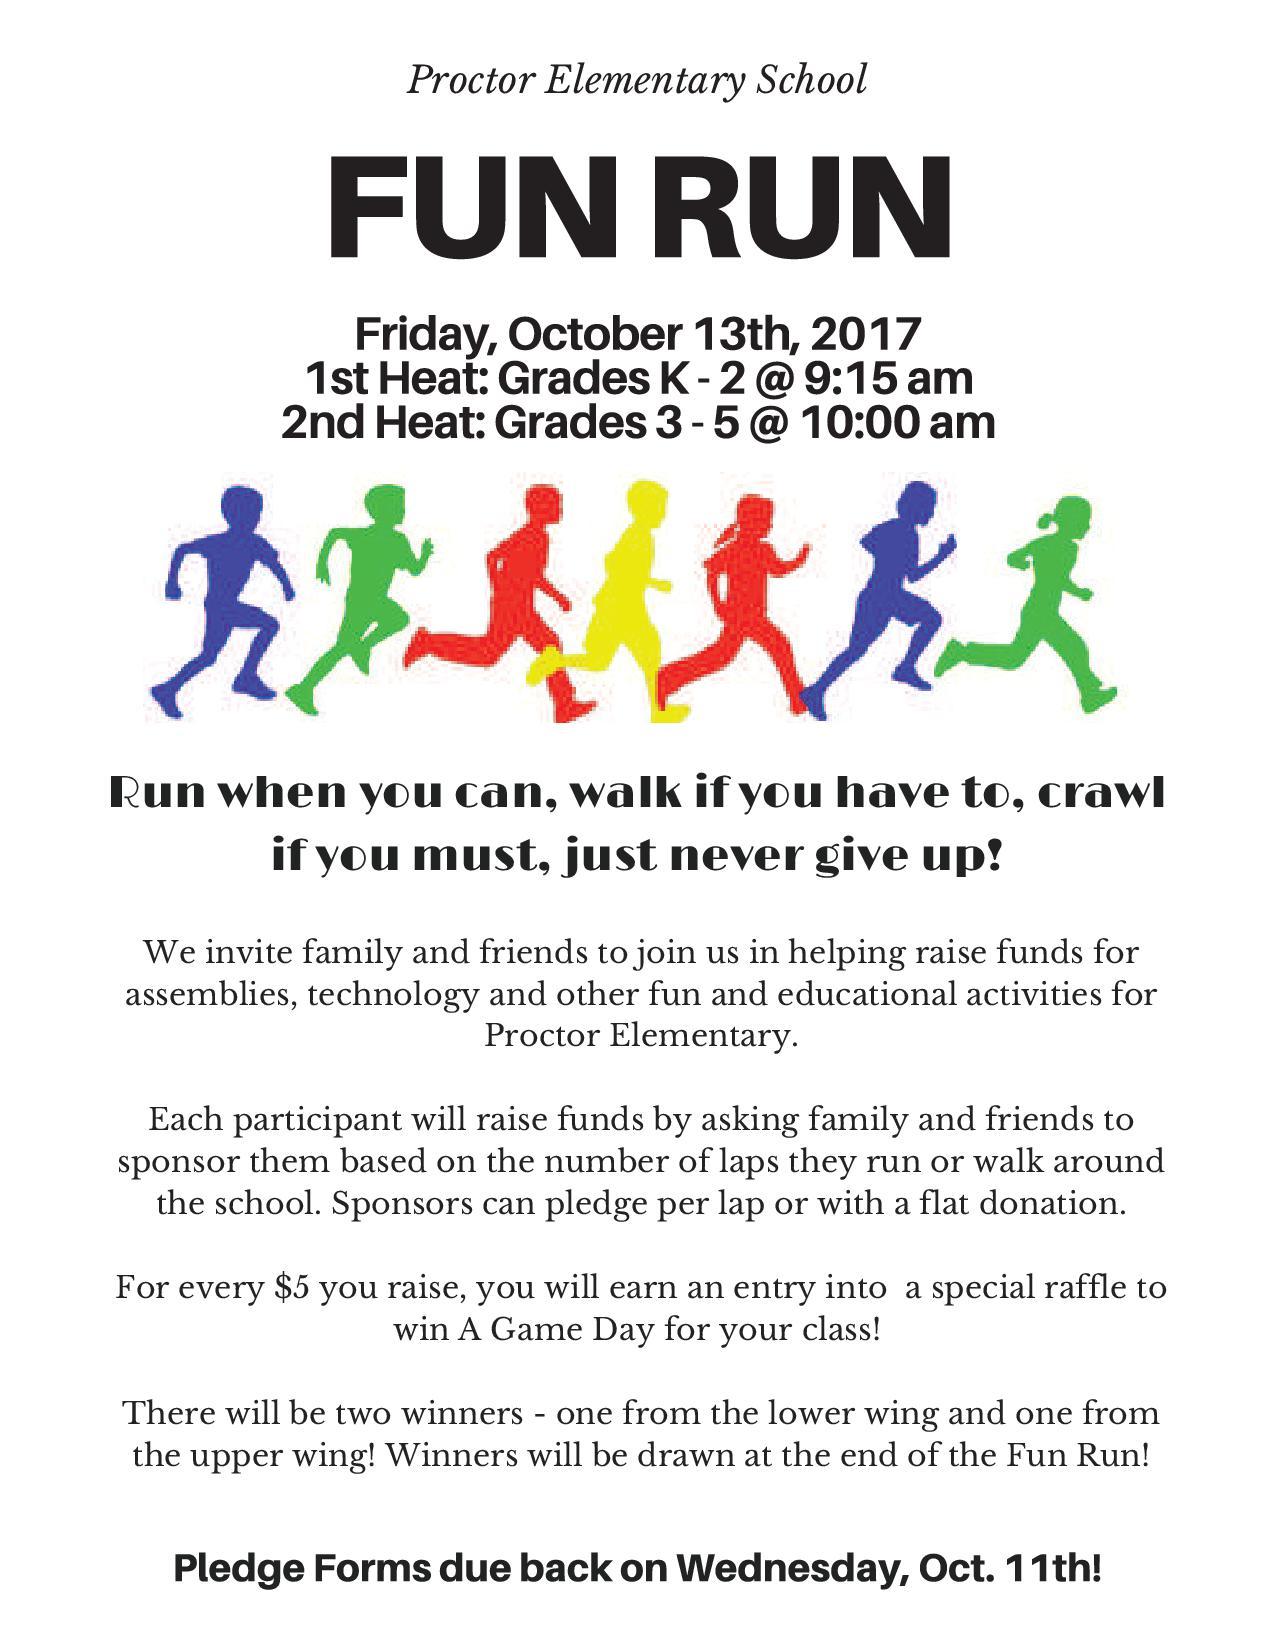 Fun Run Pledge Form